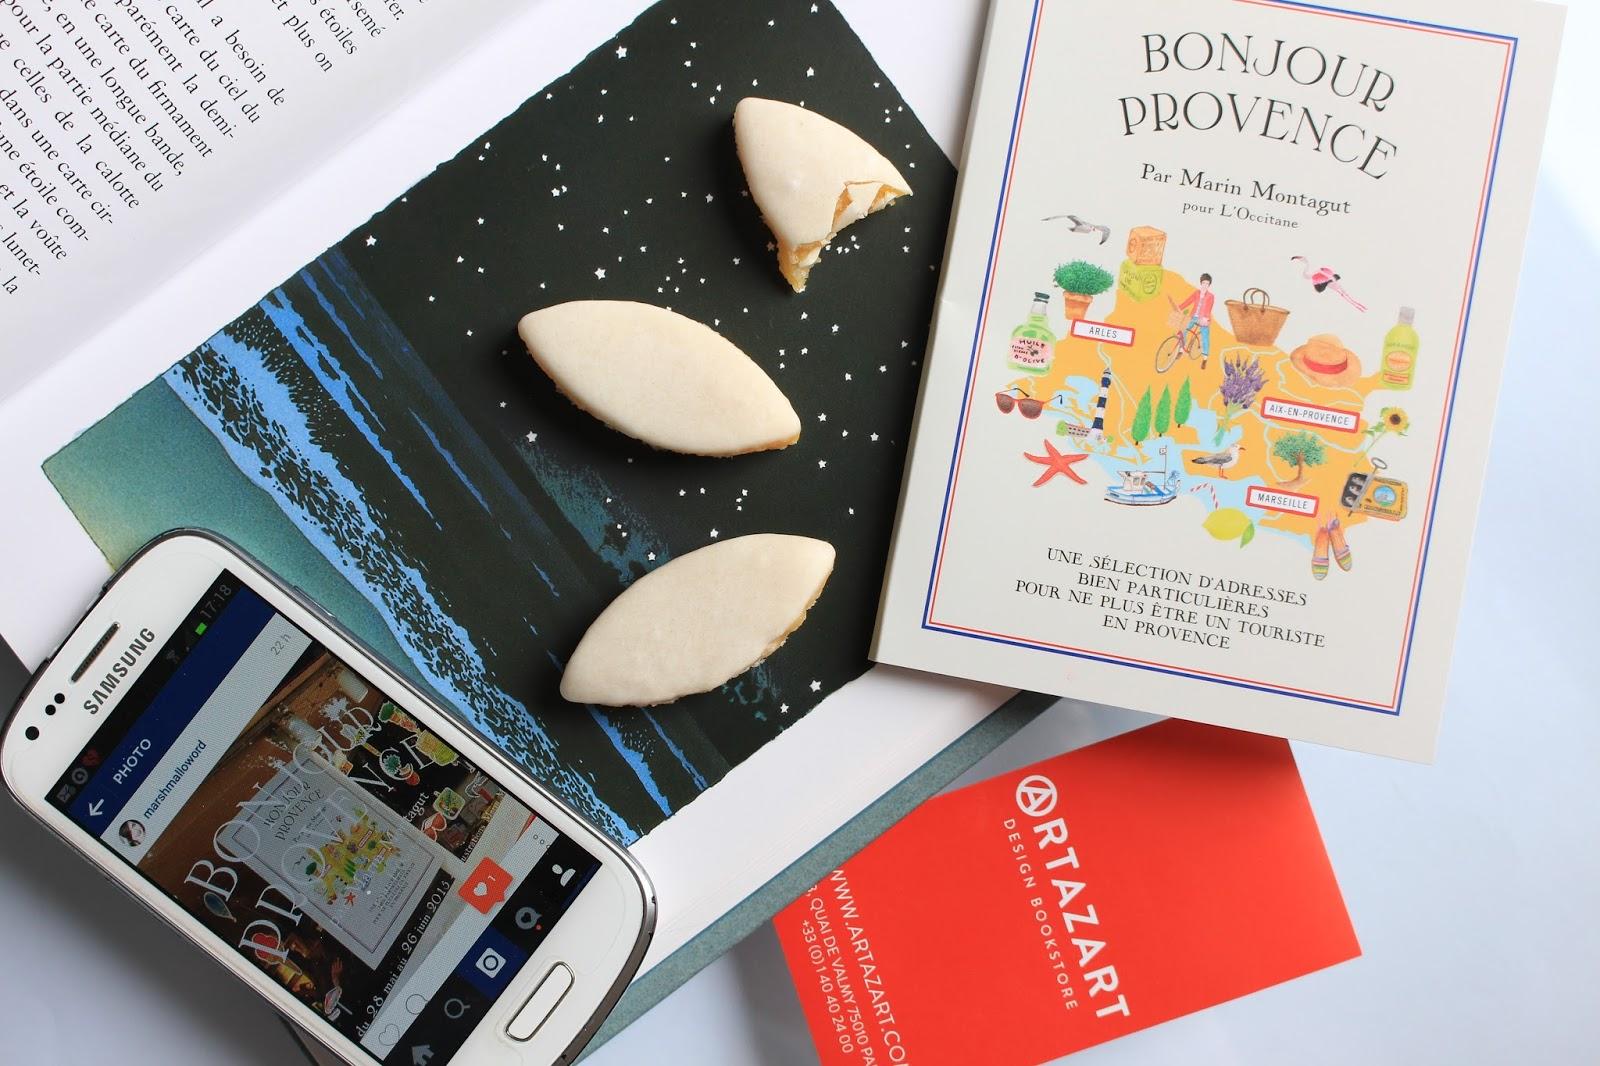 Bonjour Provence Marin Montagut